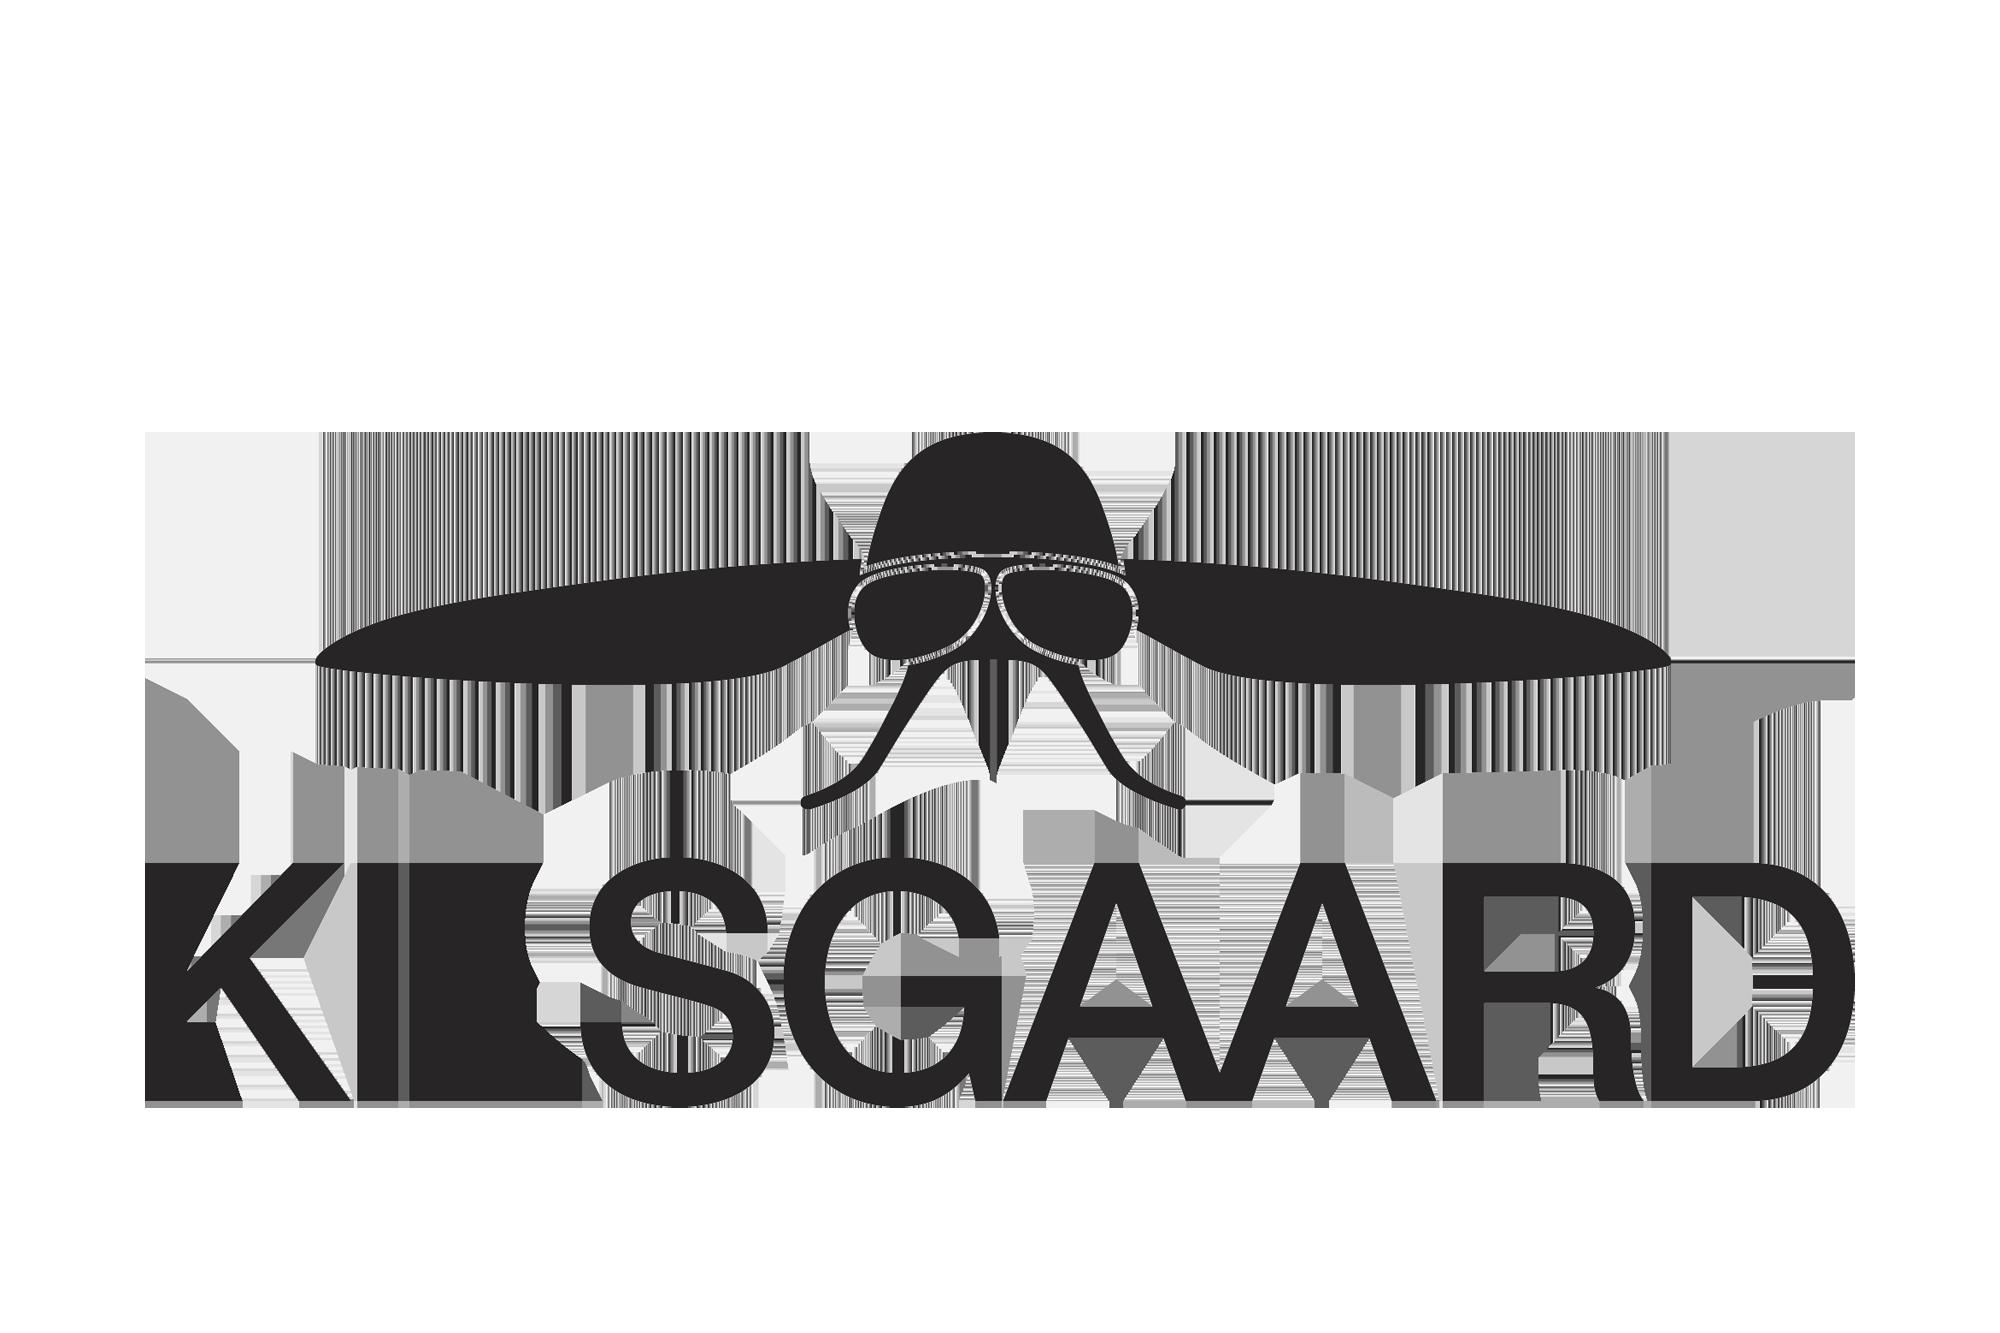 Kilsgaard - Modell 57.10/1